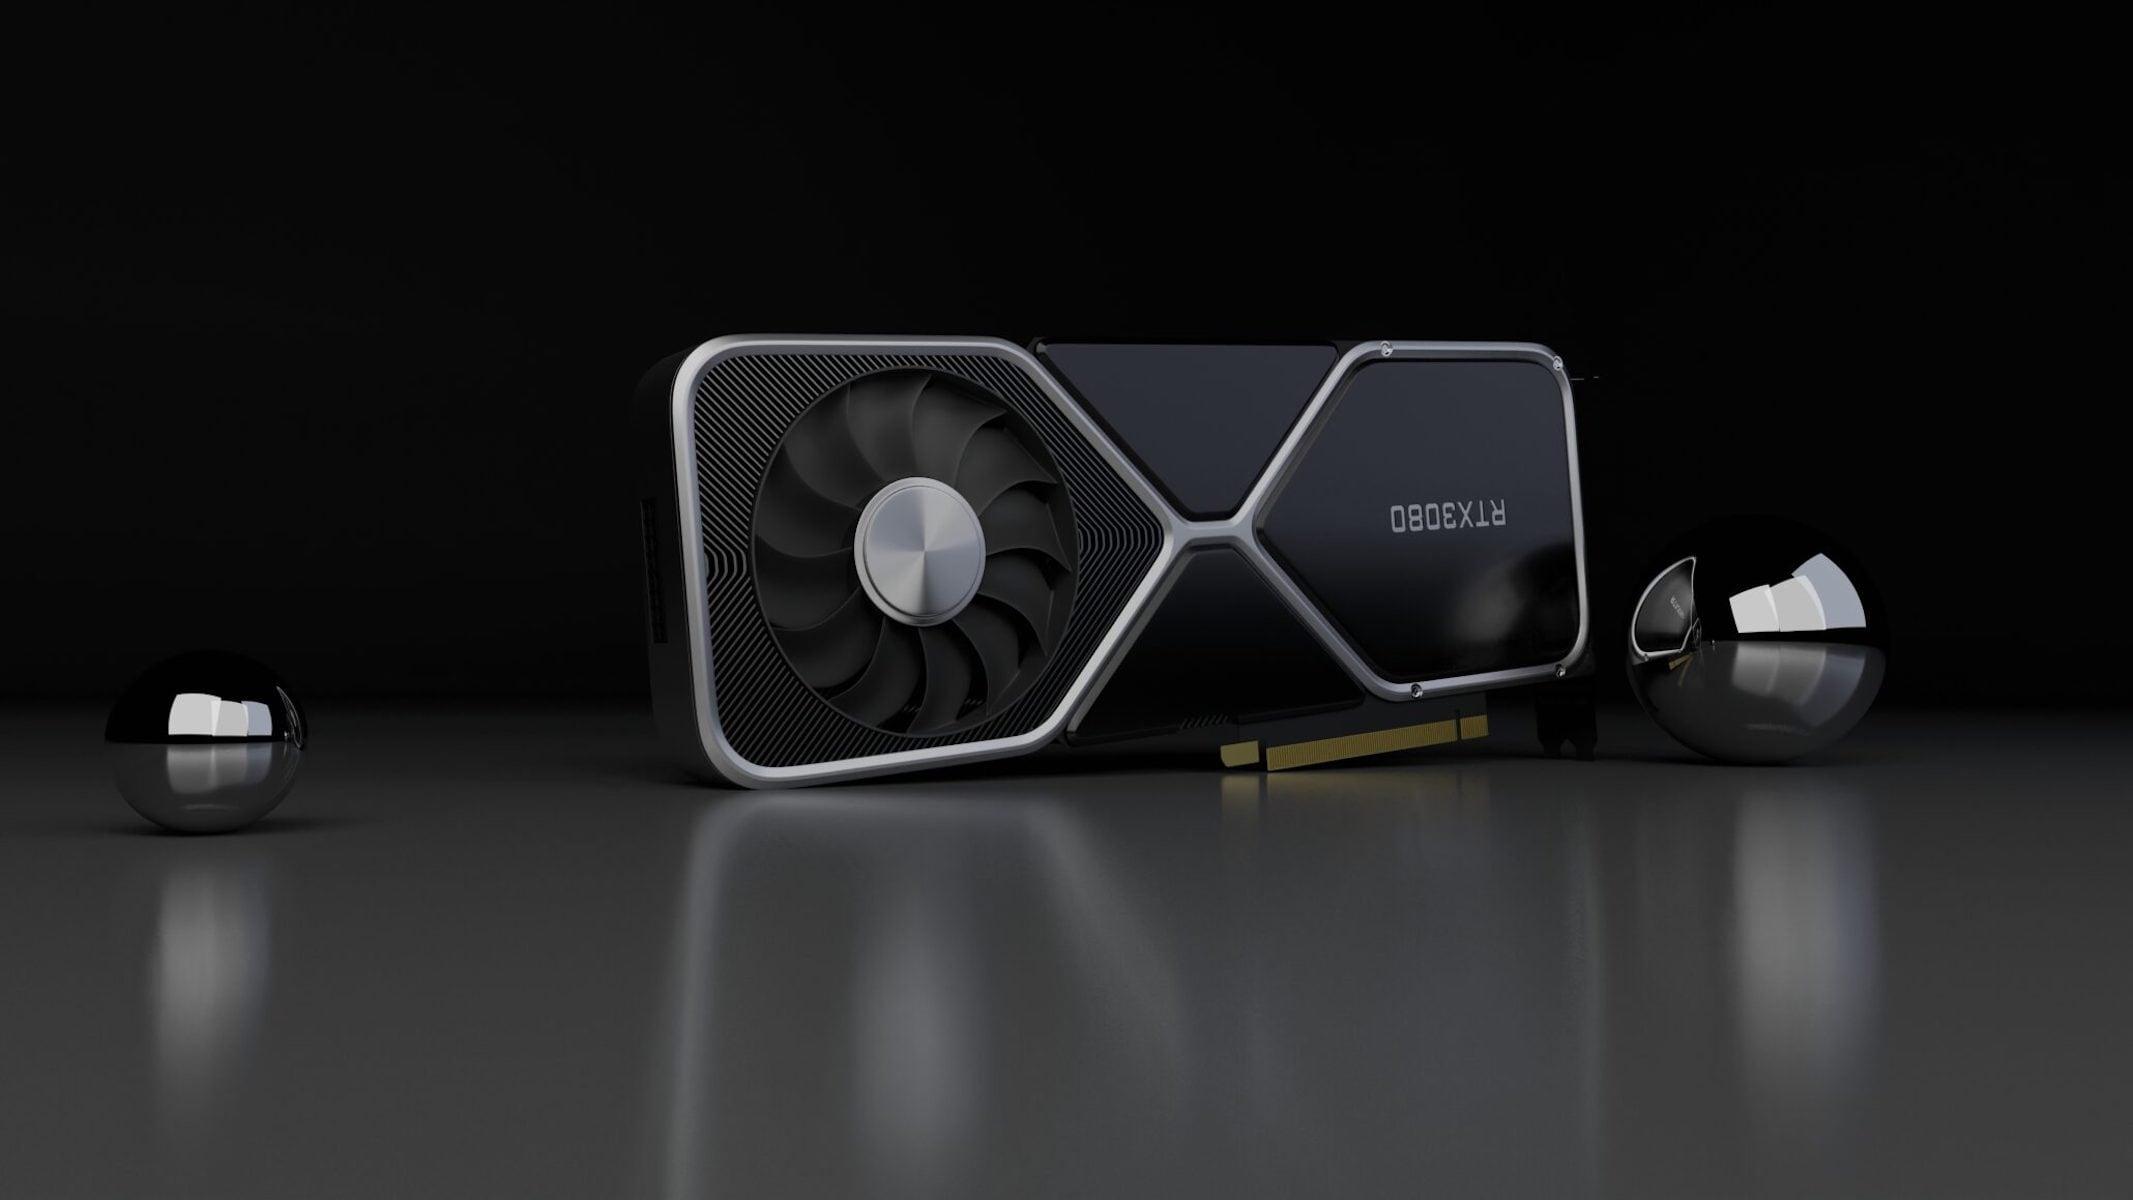 NVIDIA RTX GeForce 30 series GPU